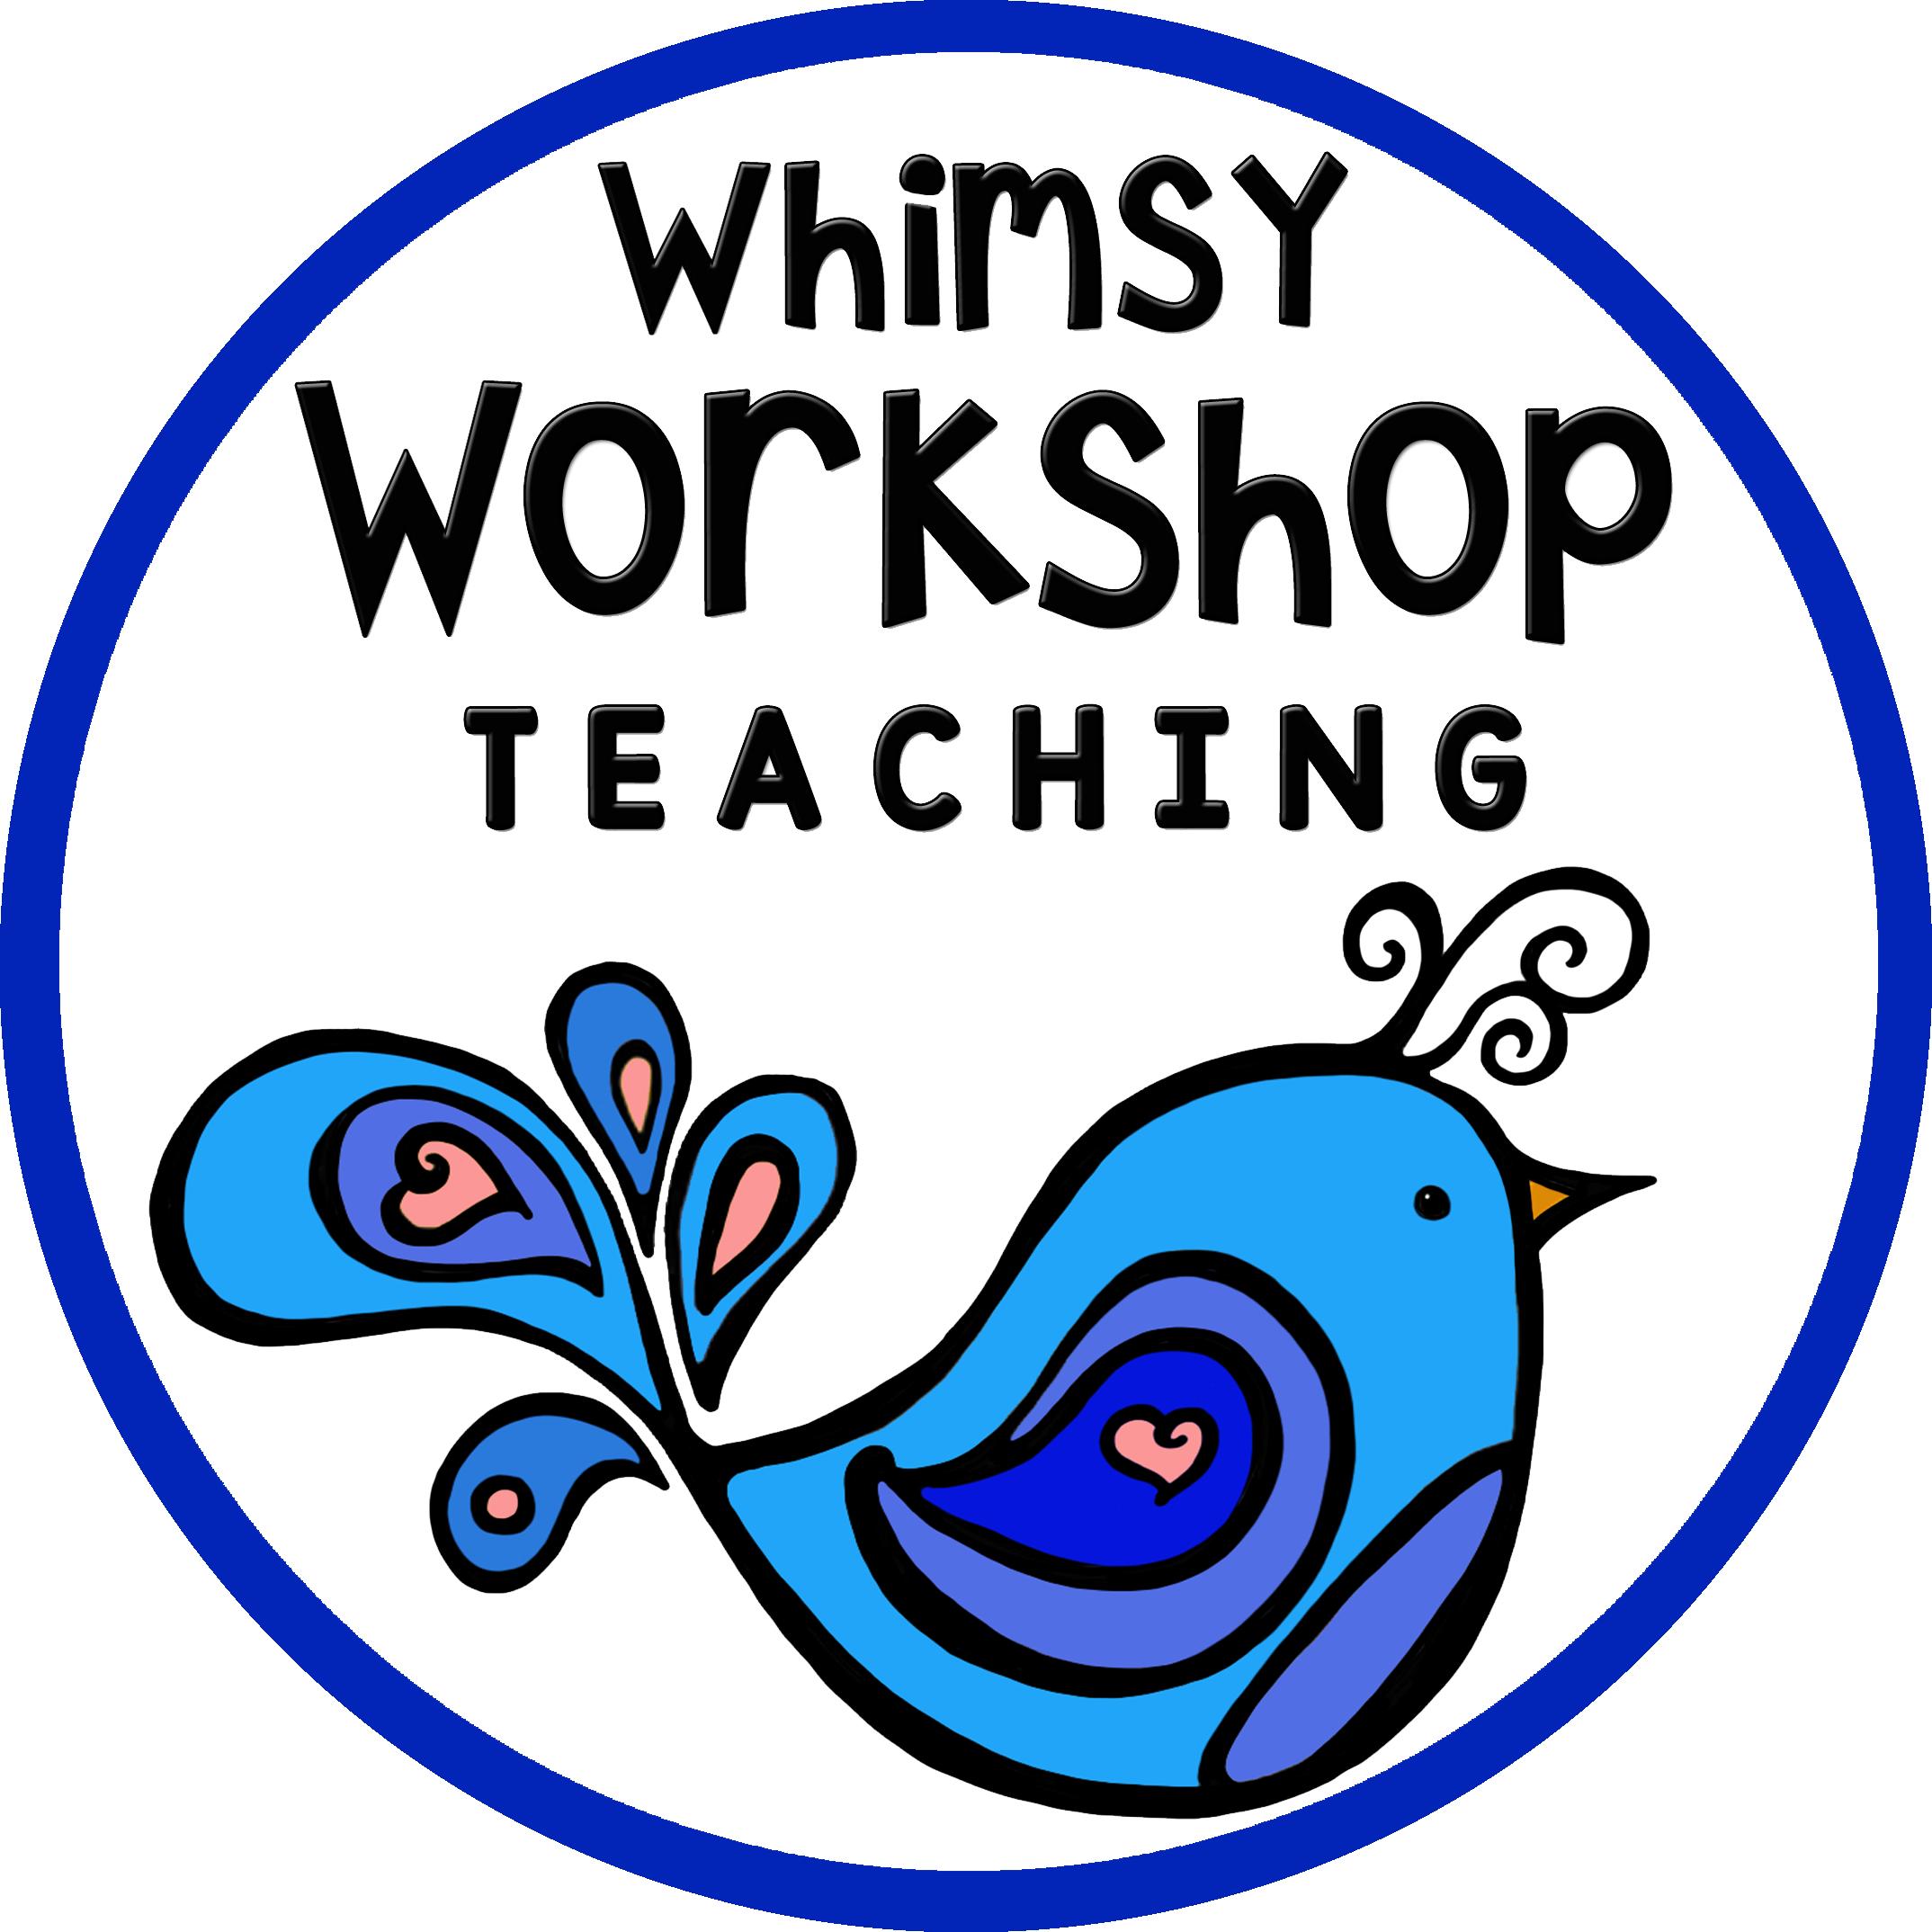 Desk clipart literature. Whimsy workshop teaching teacher